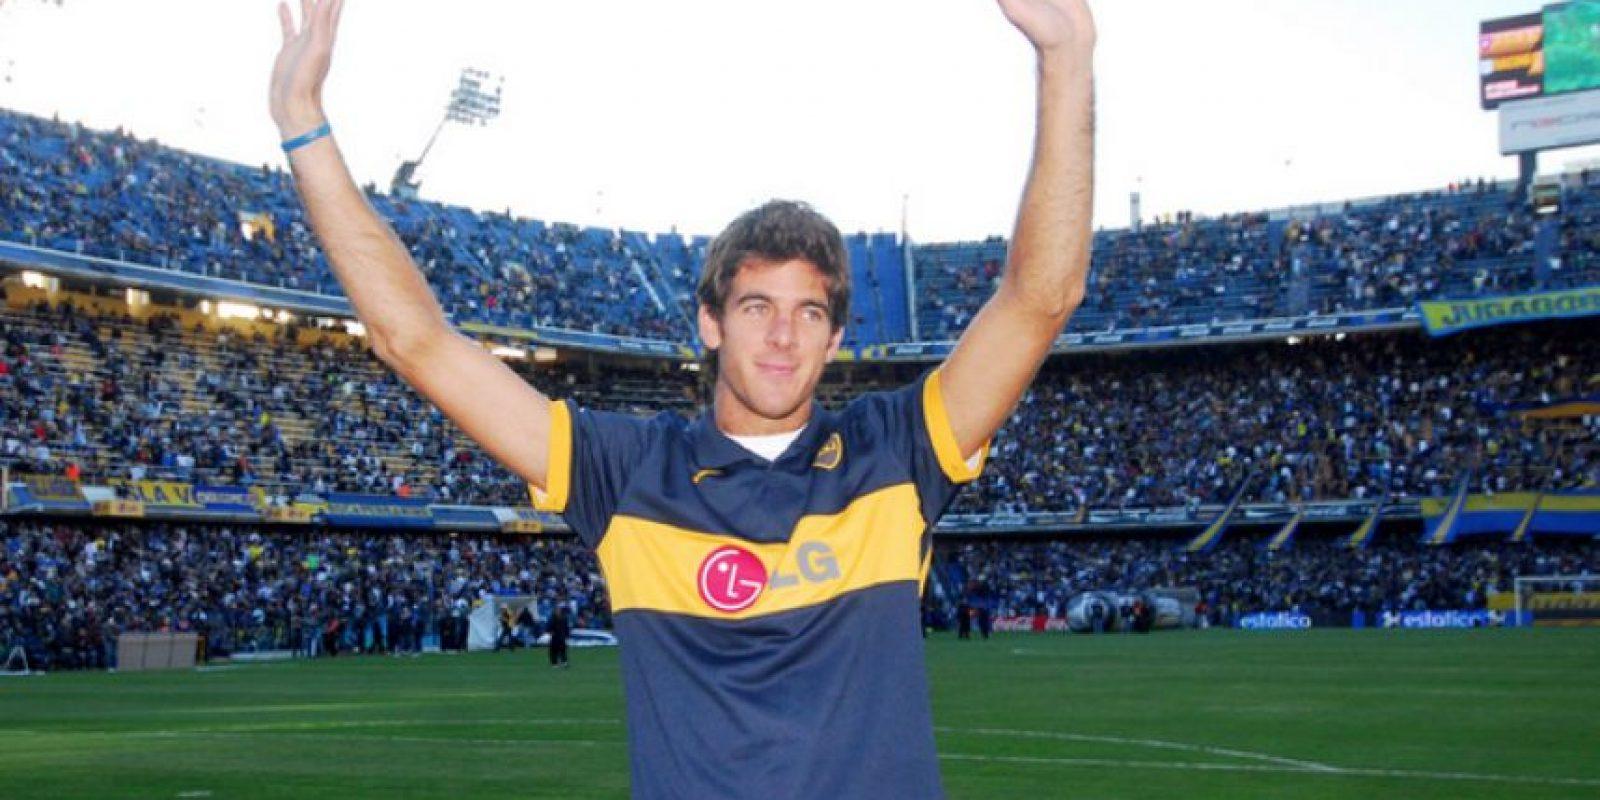 Juan Martín del Potro (tenista argentino) – Boca Juniors